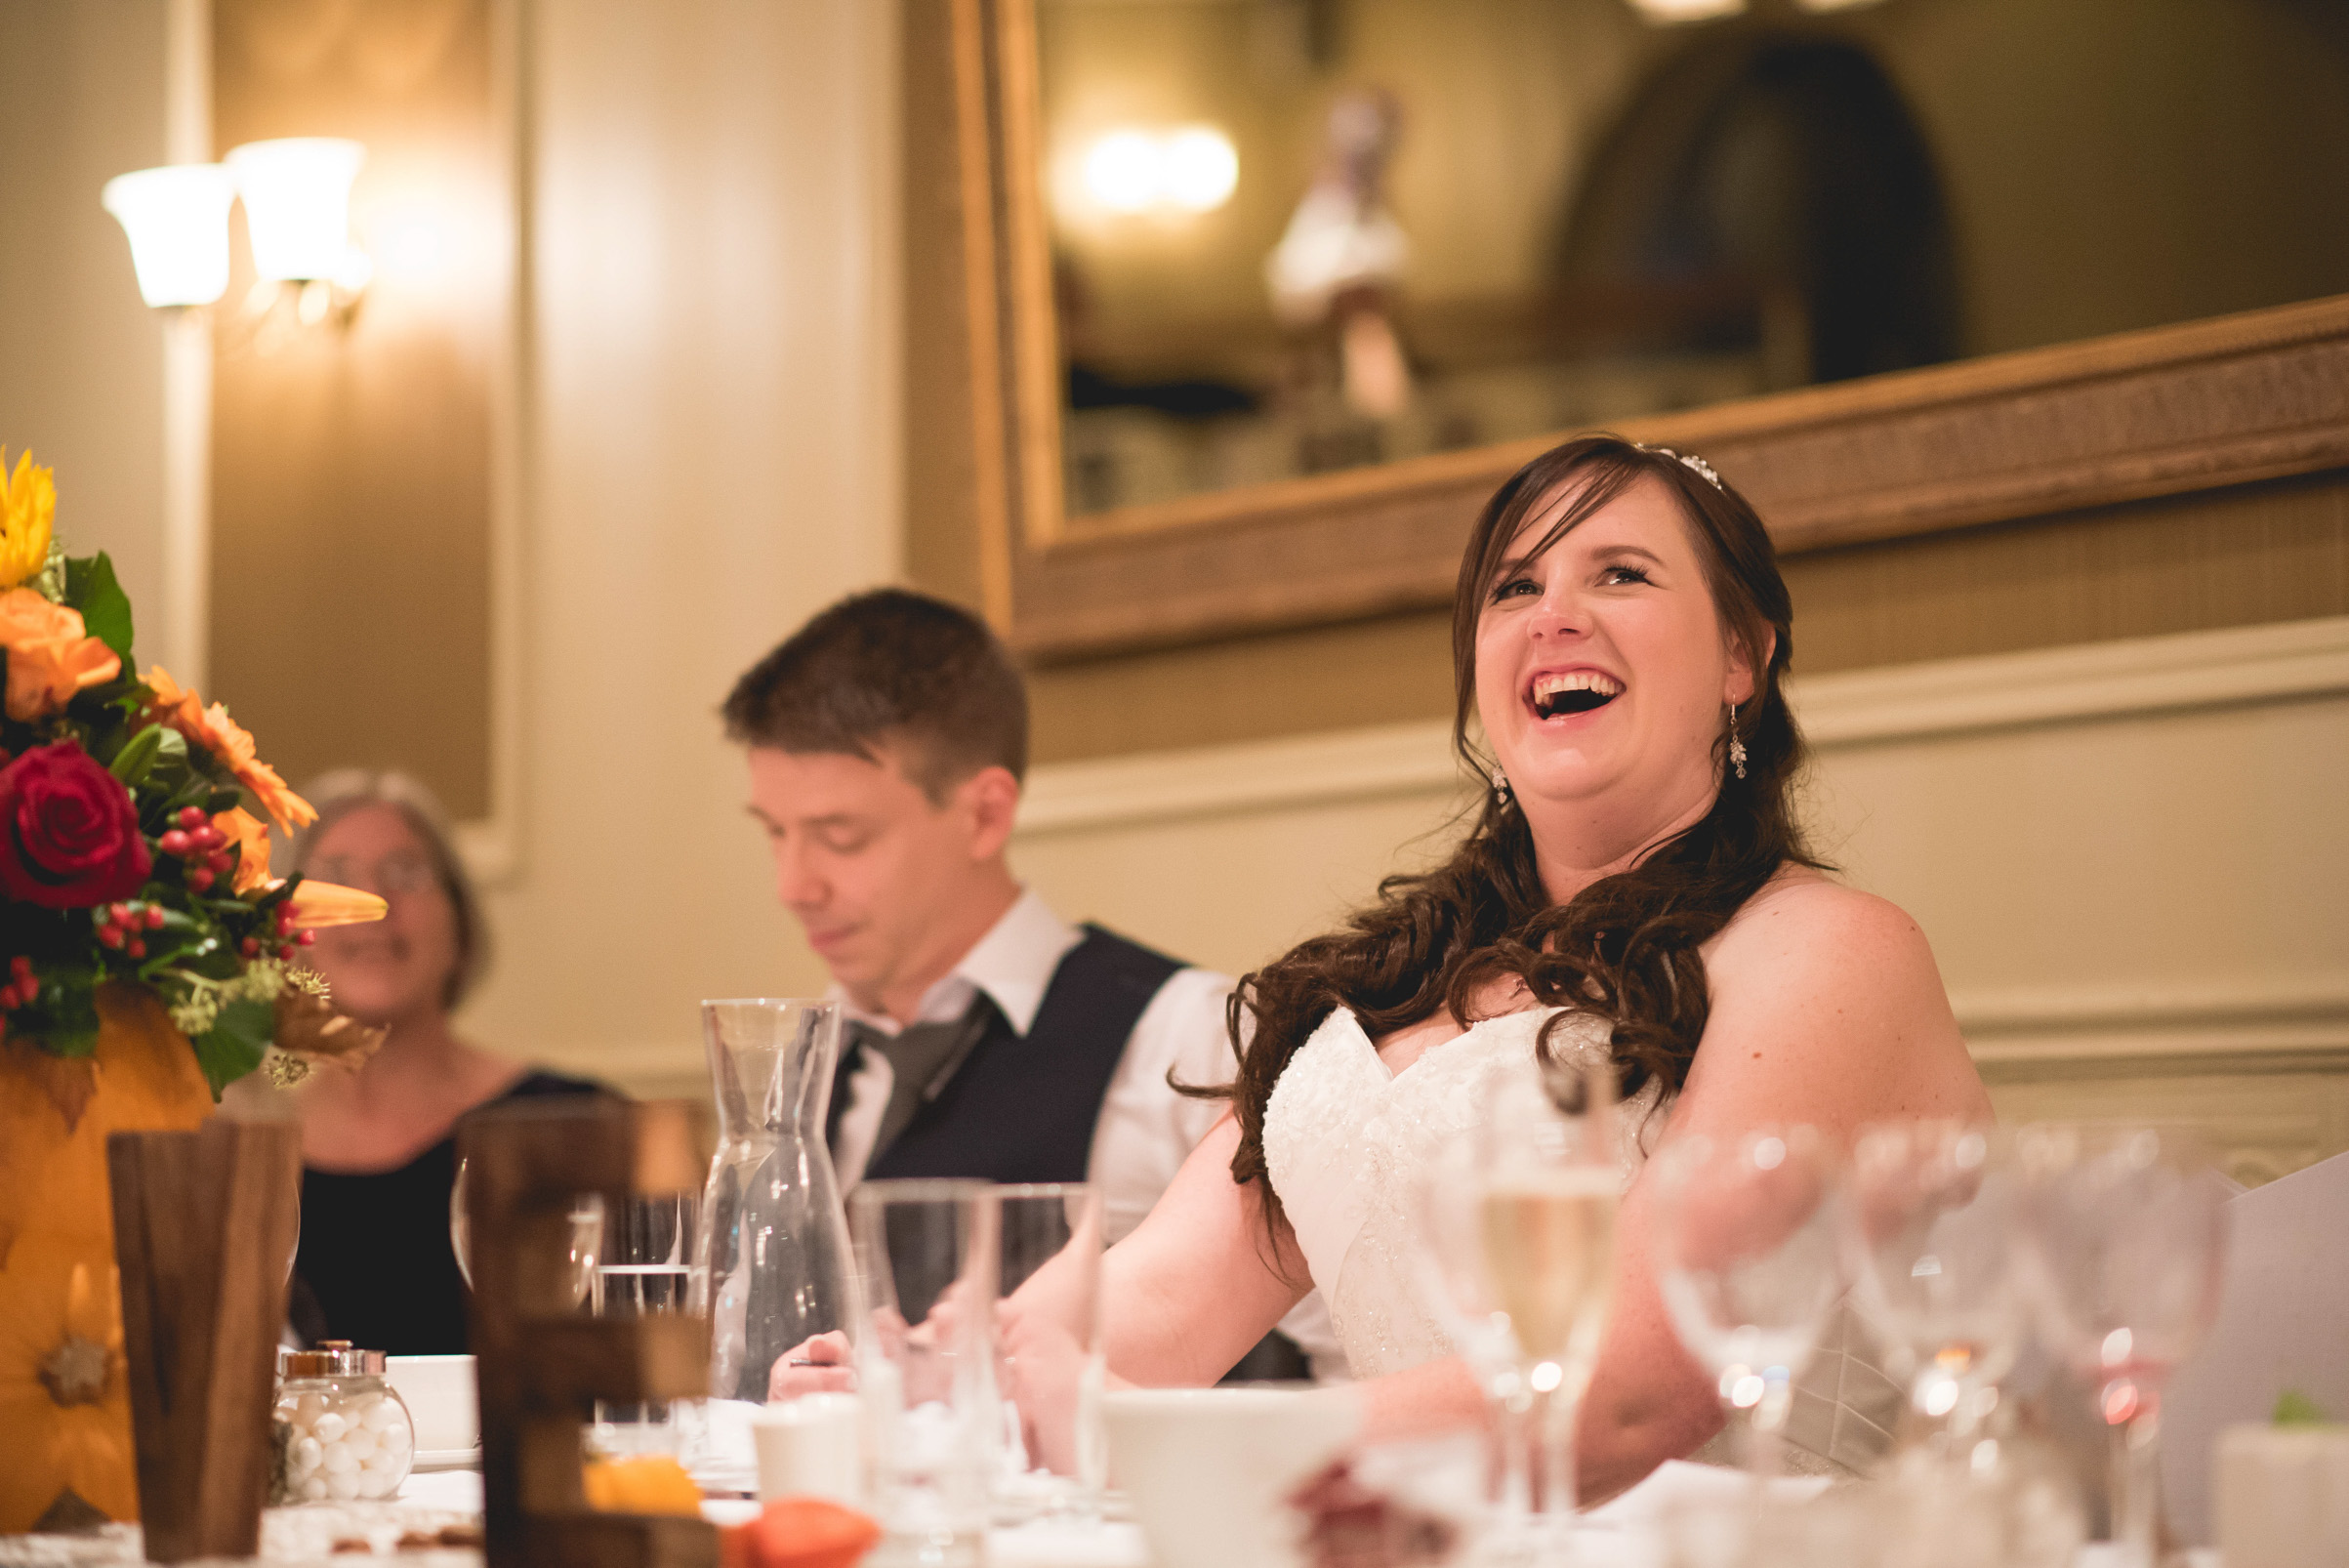 The+Fairlawns+wedding+Aldridge+StLukes+Church-185.jpg